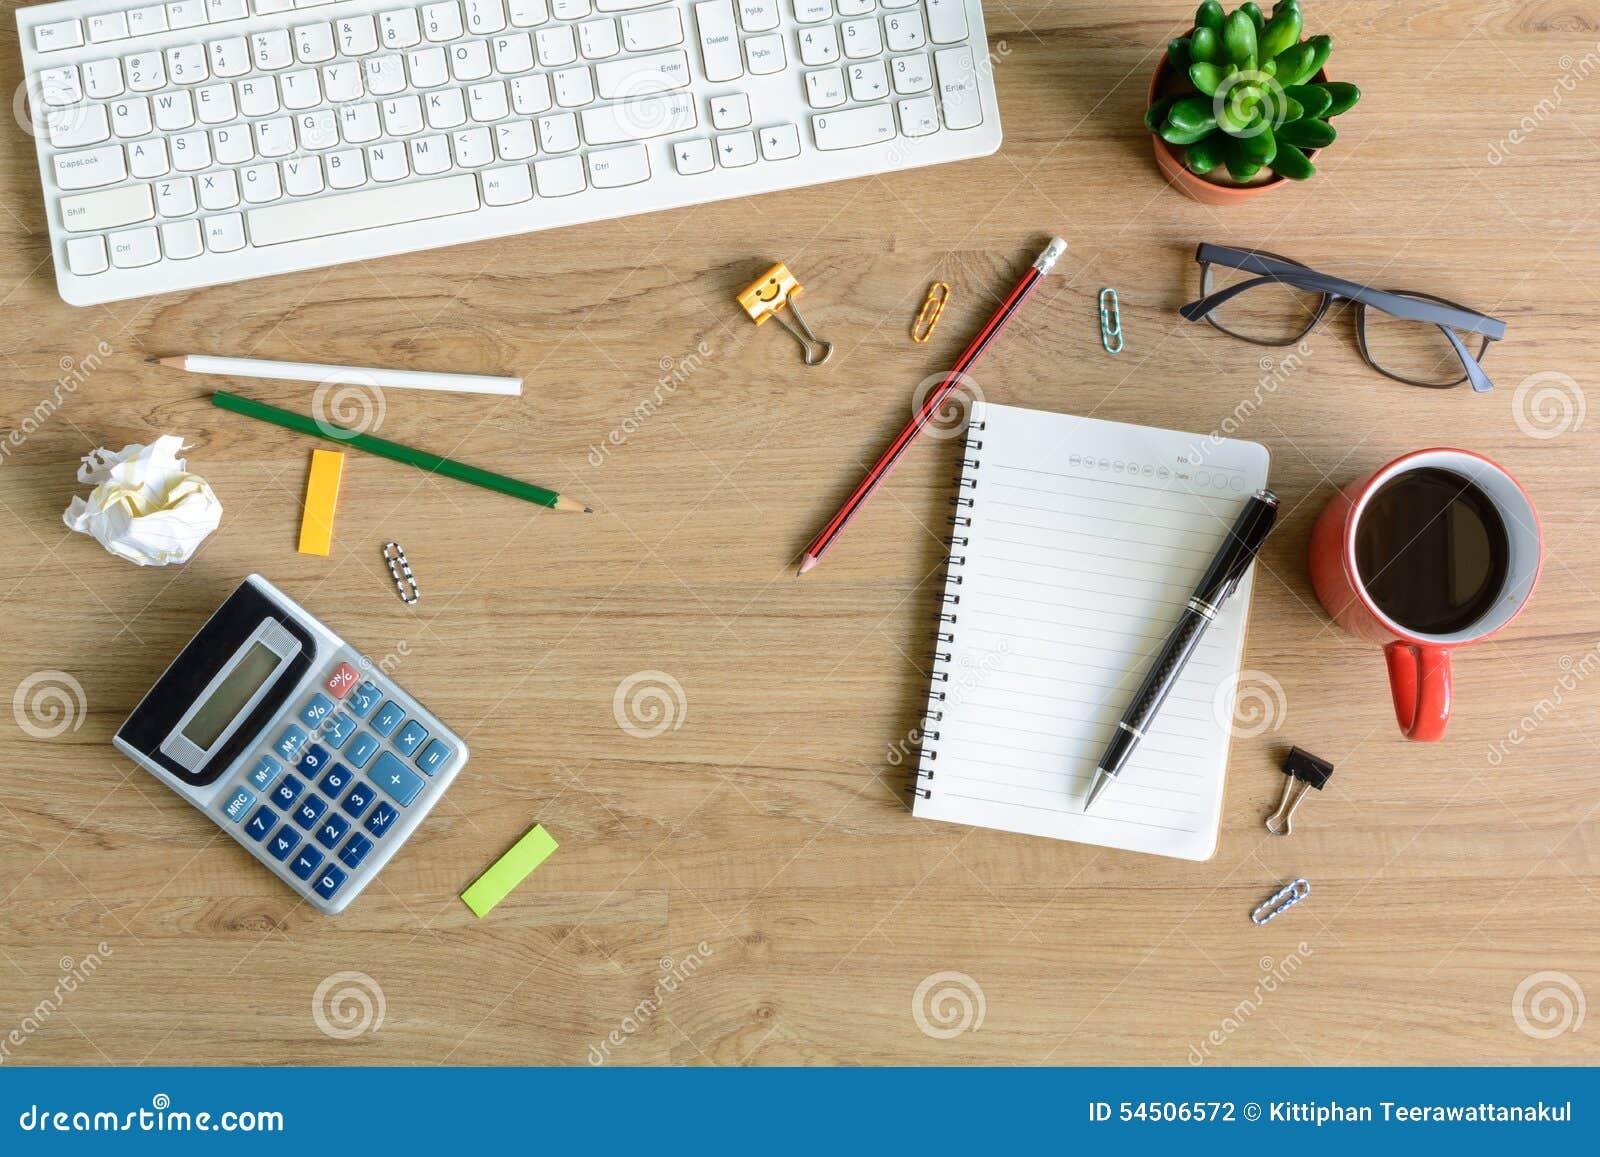 Fourniture de bureau et tasse de café sur le bureau